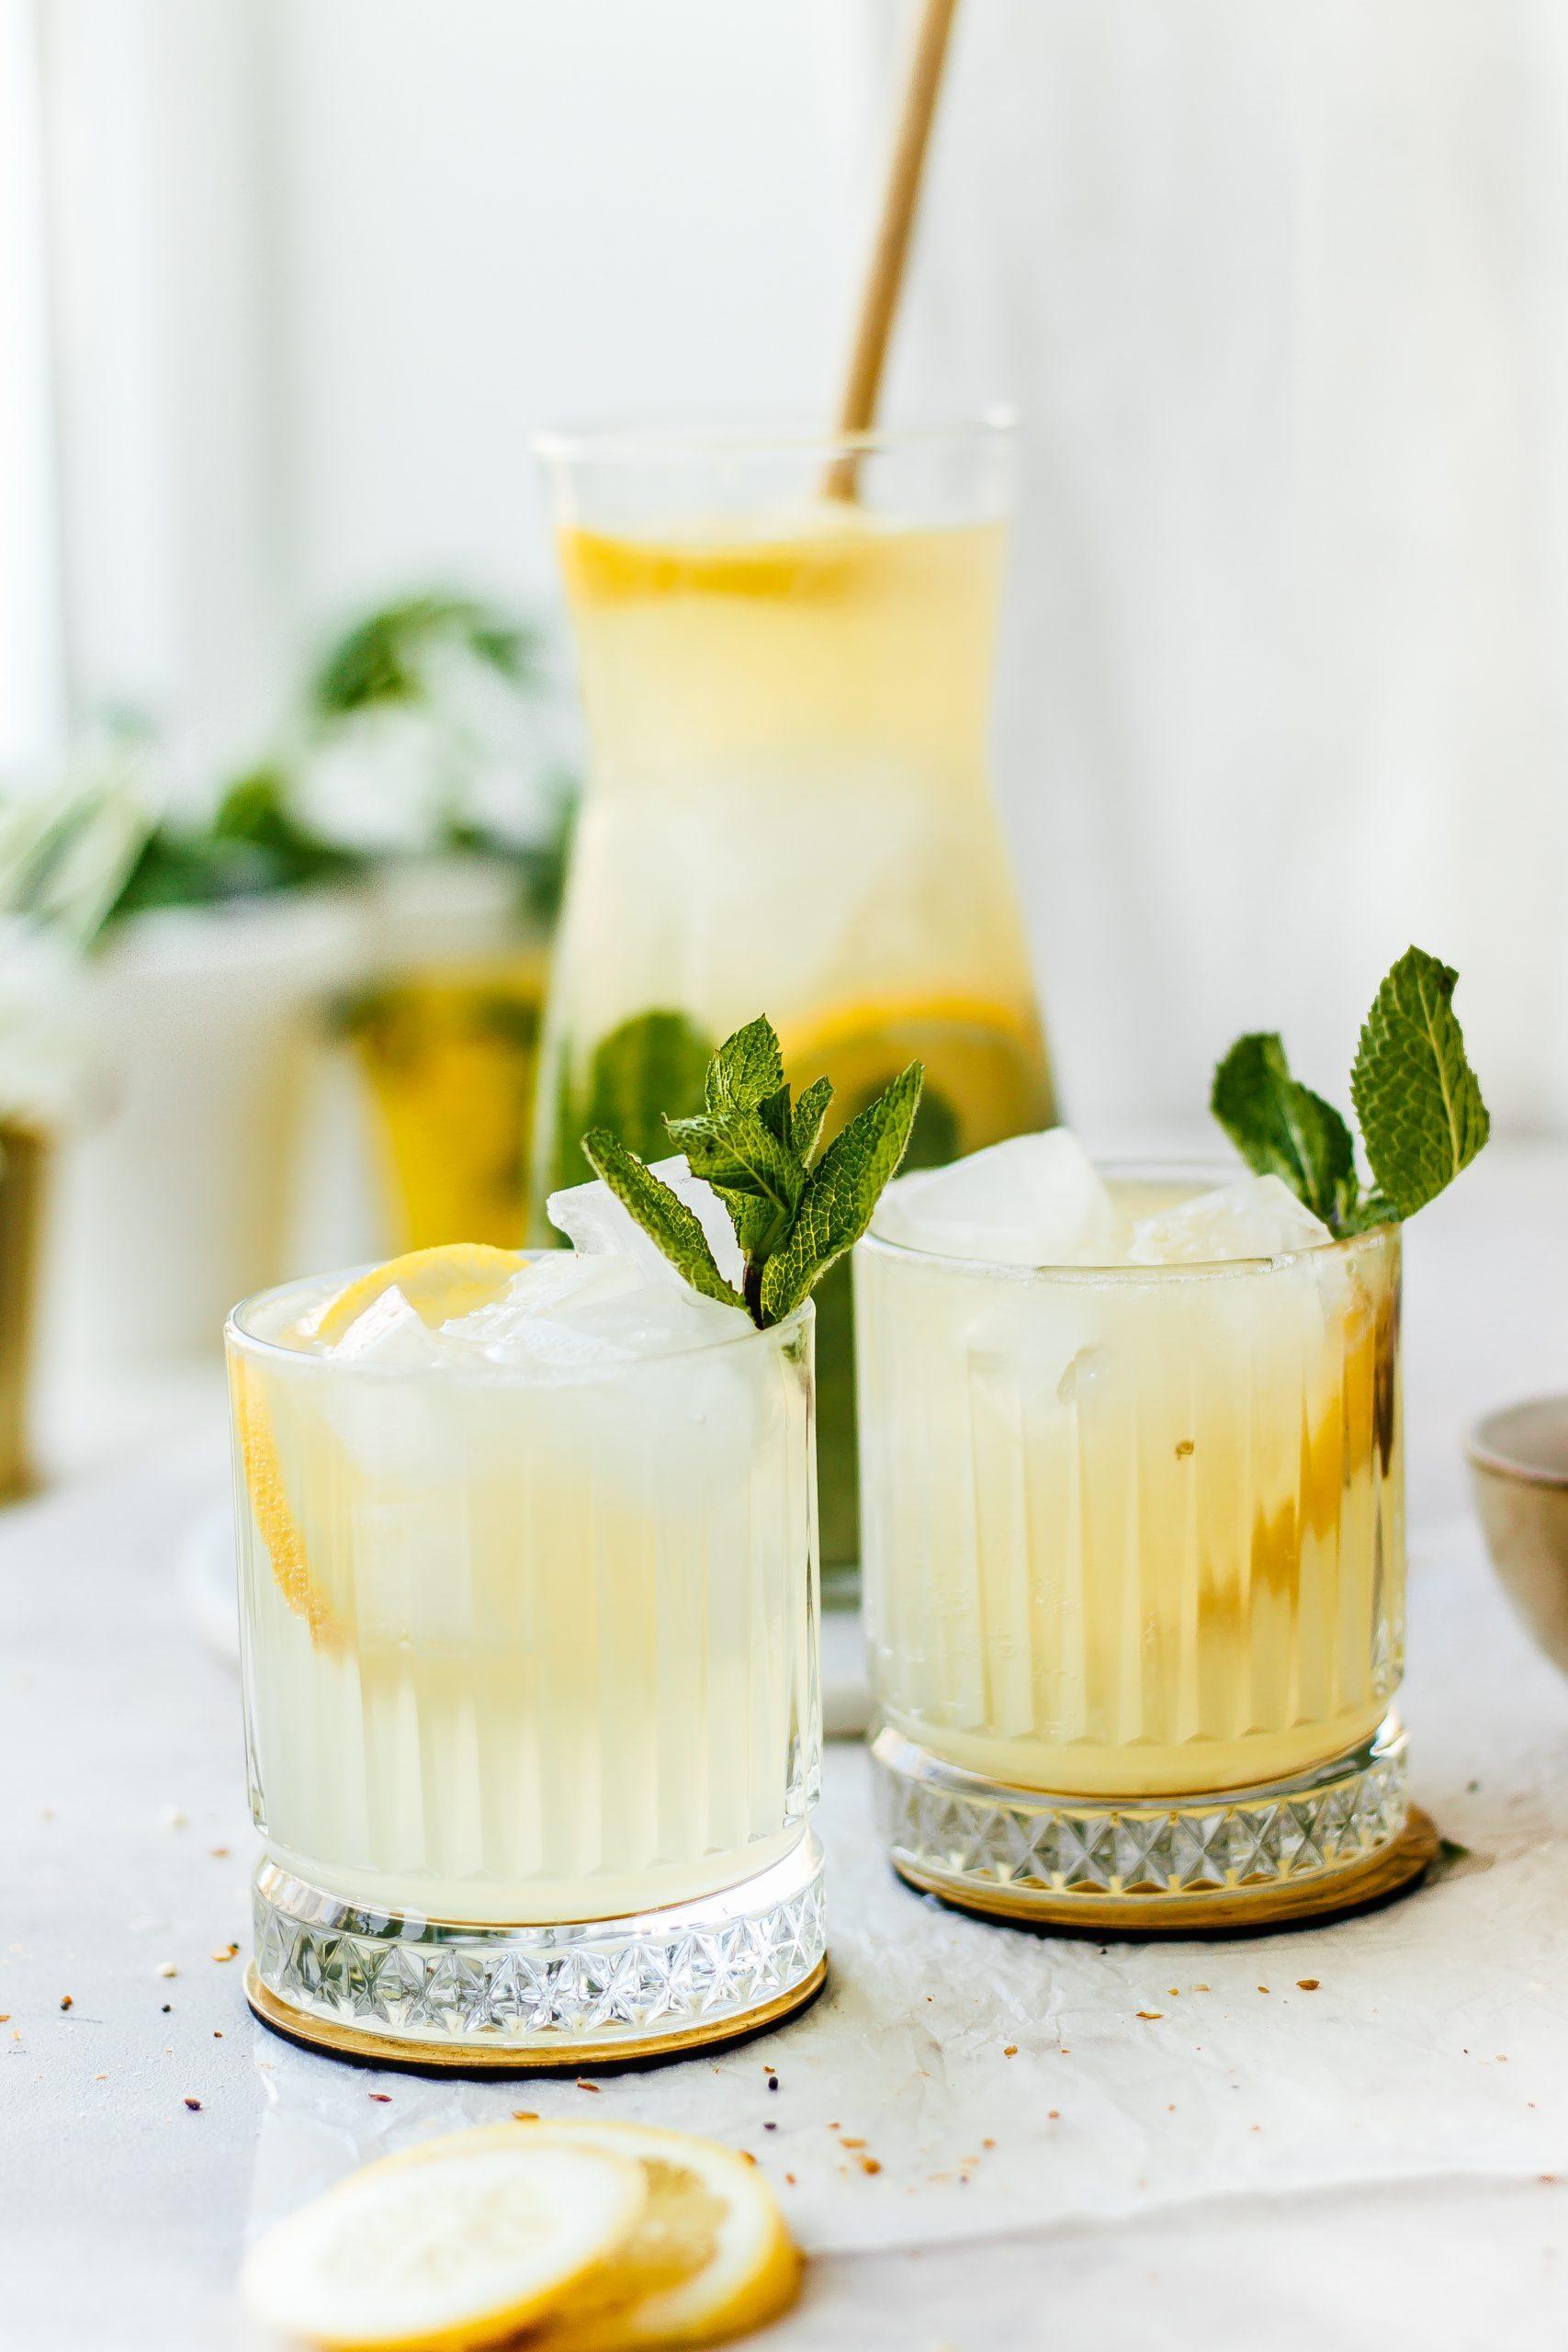 Frisse gember munt limonade